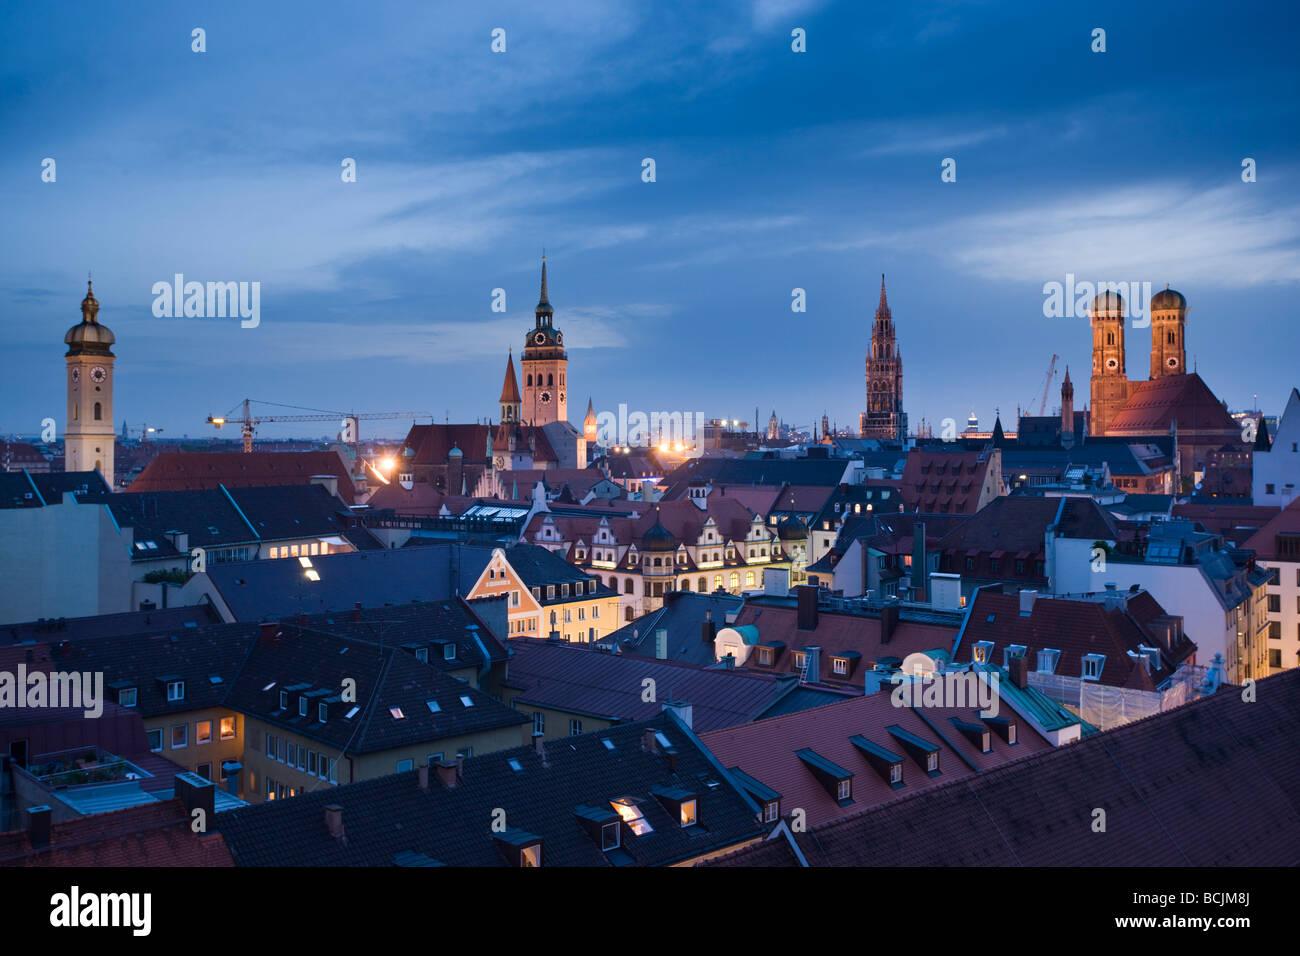 Alemania, Bayern/Baviera, Munich, casco antiguo de Munich Hotel Mandarin-Oriental Imagen De Stock